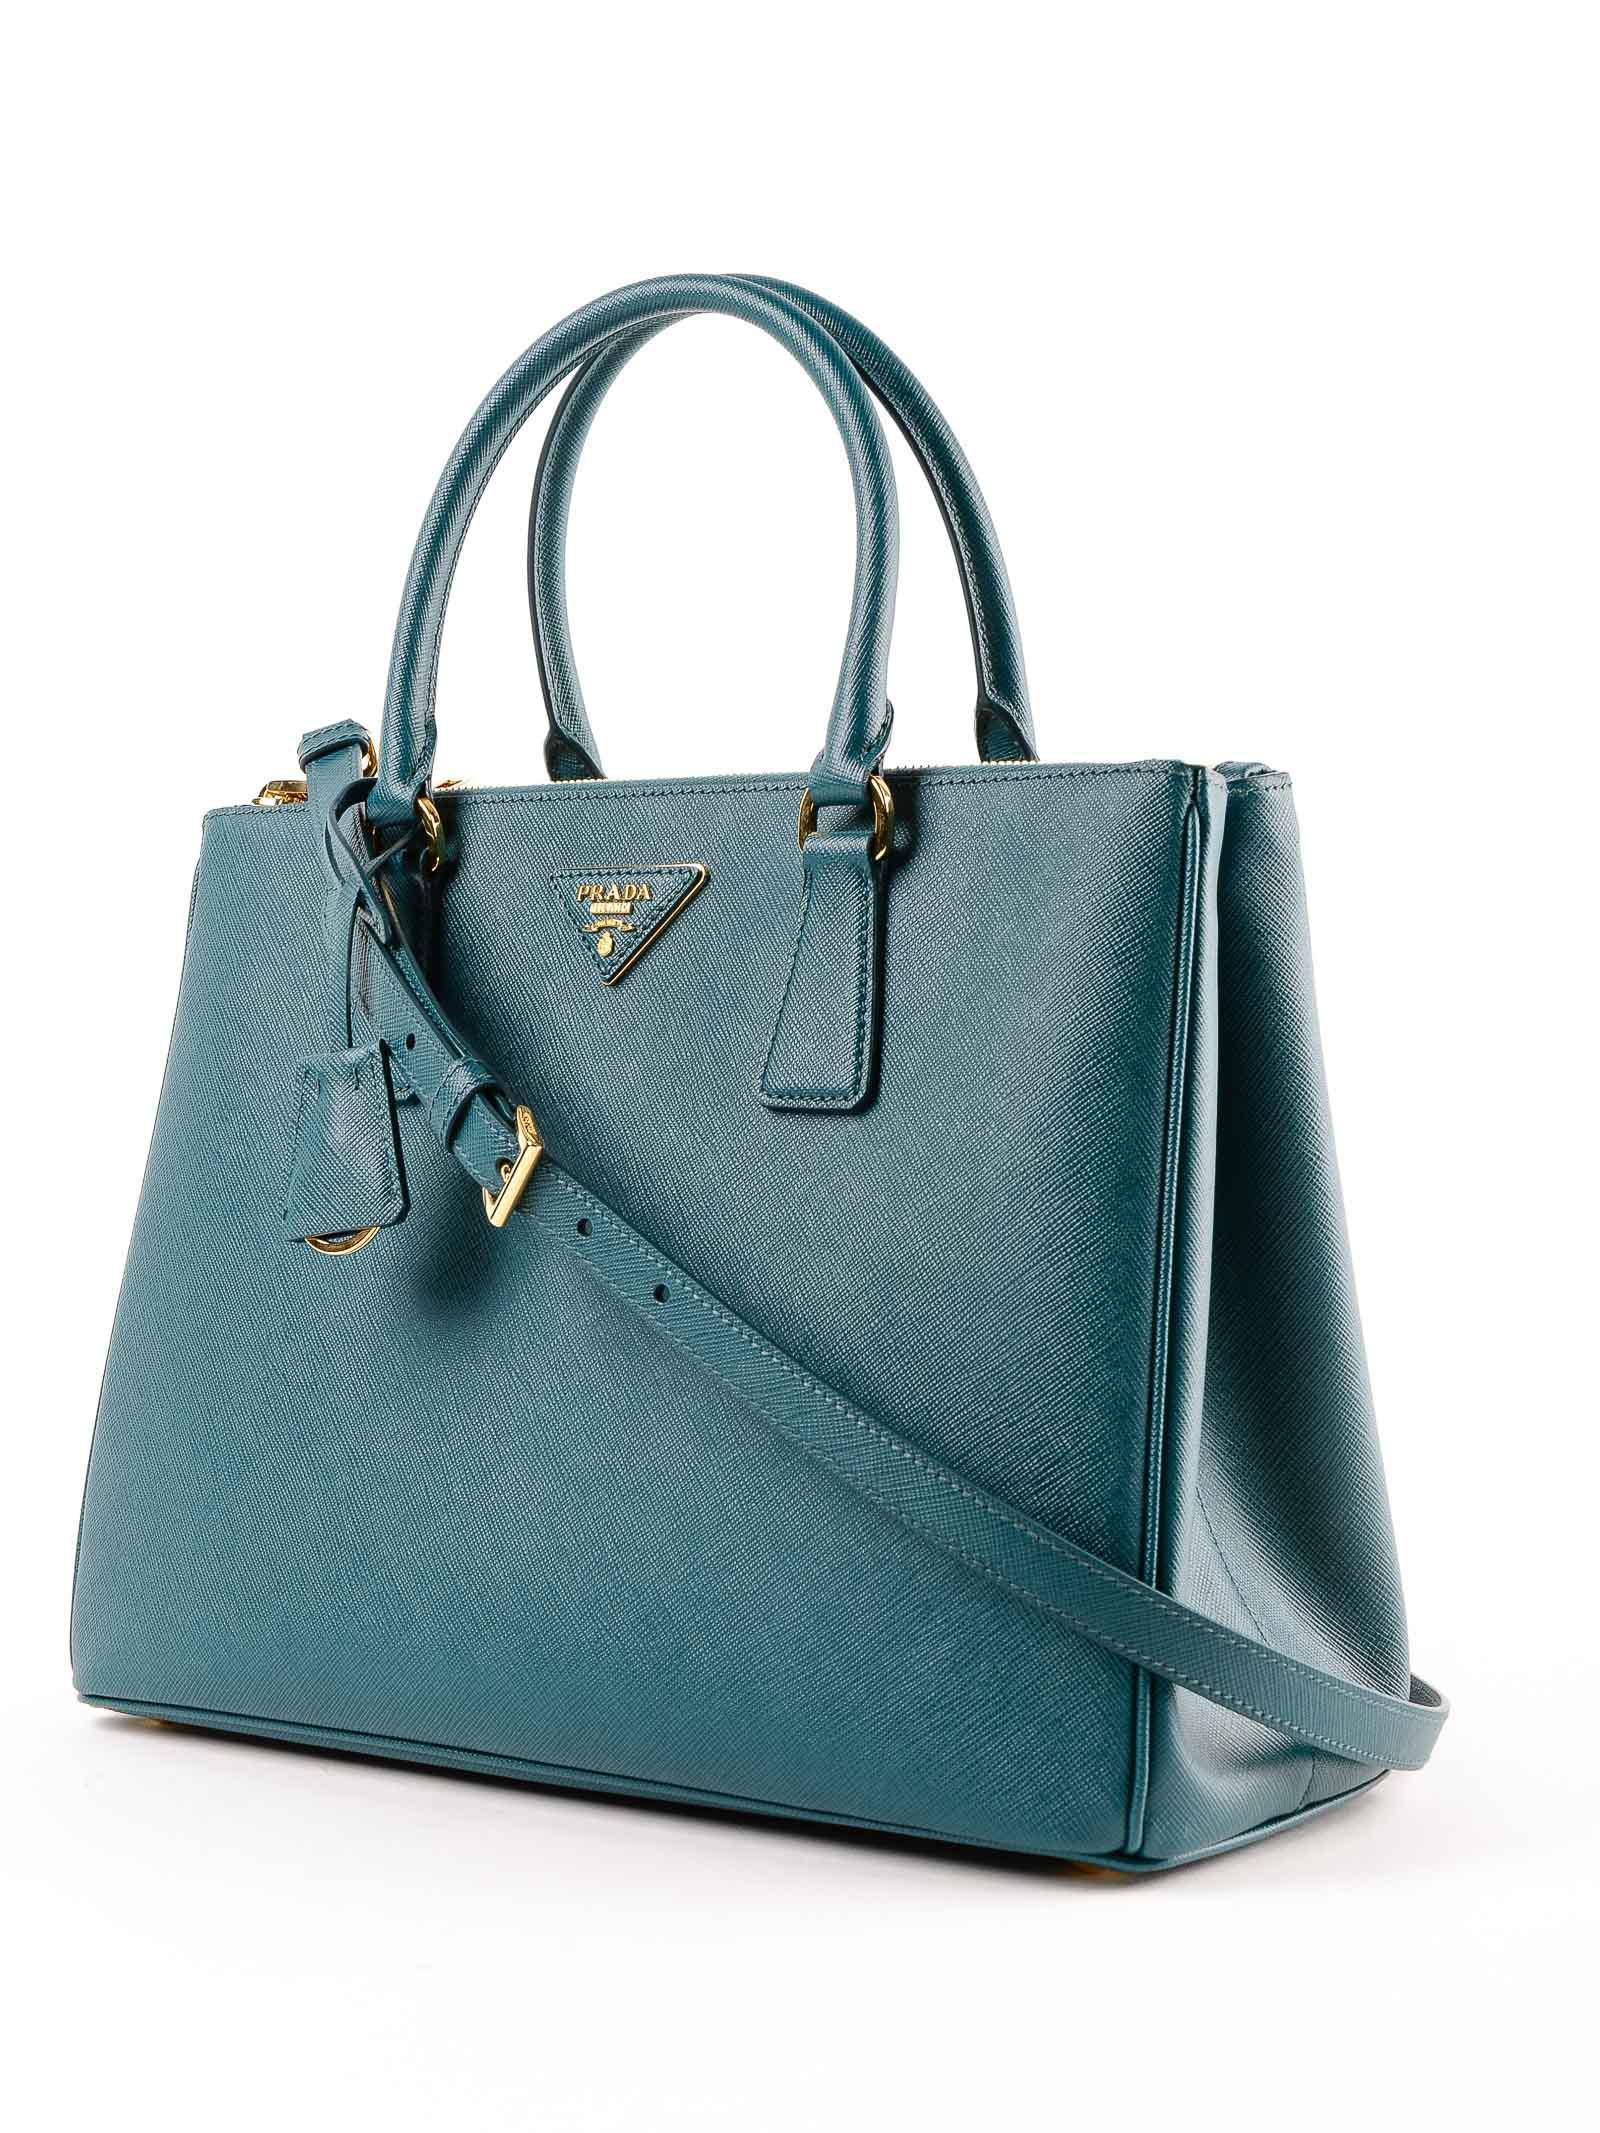 9e555b6bd9de ... good lyst prada galleria handbag saffiano lux in blue b041b 04116